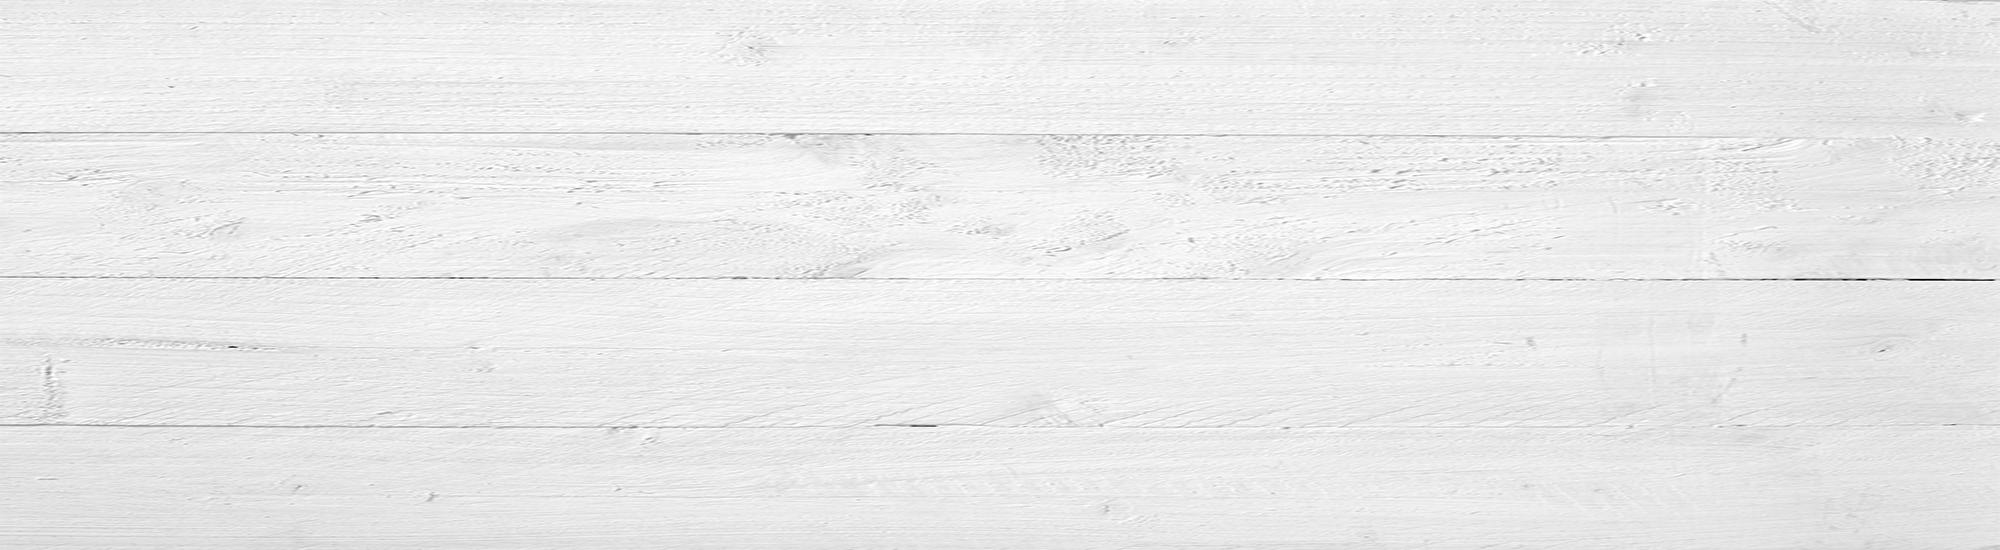 personalita catering mit einer pers nlichen note. Black Bedroom Furniture Sets. Home Design Ideas